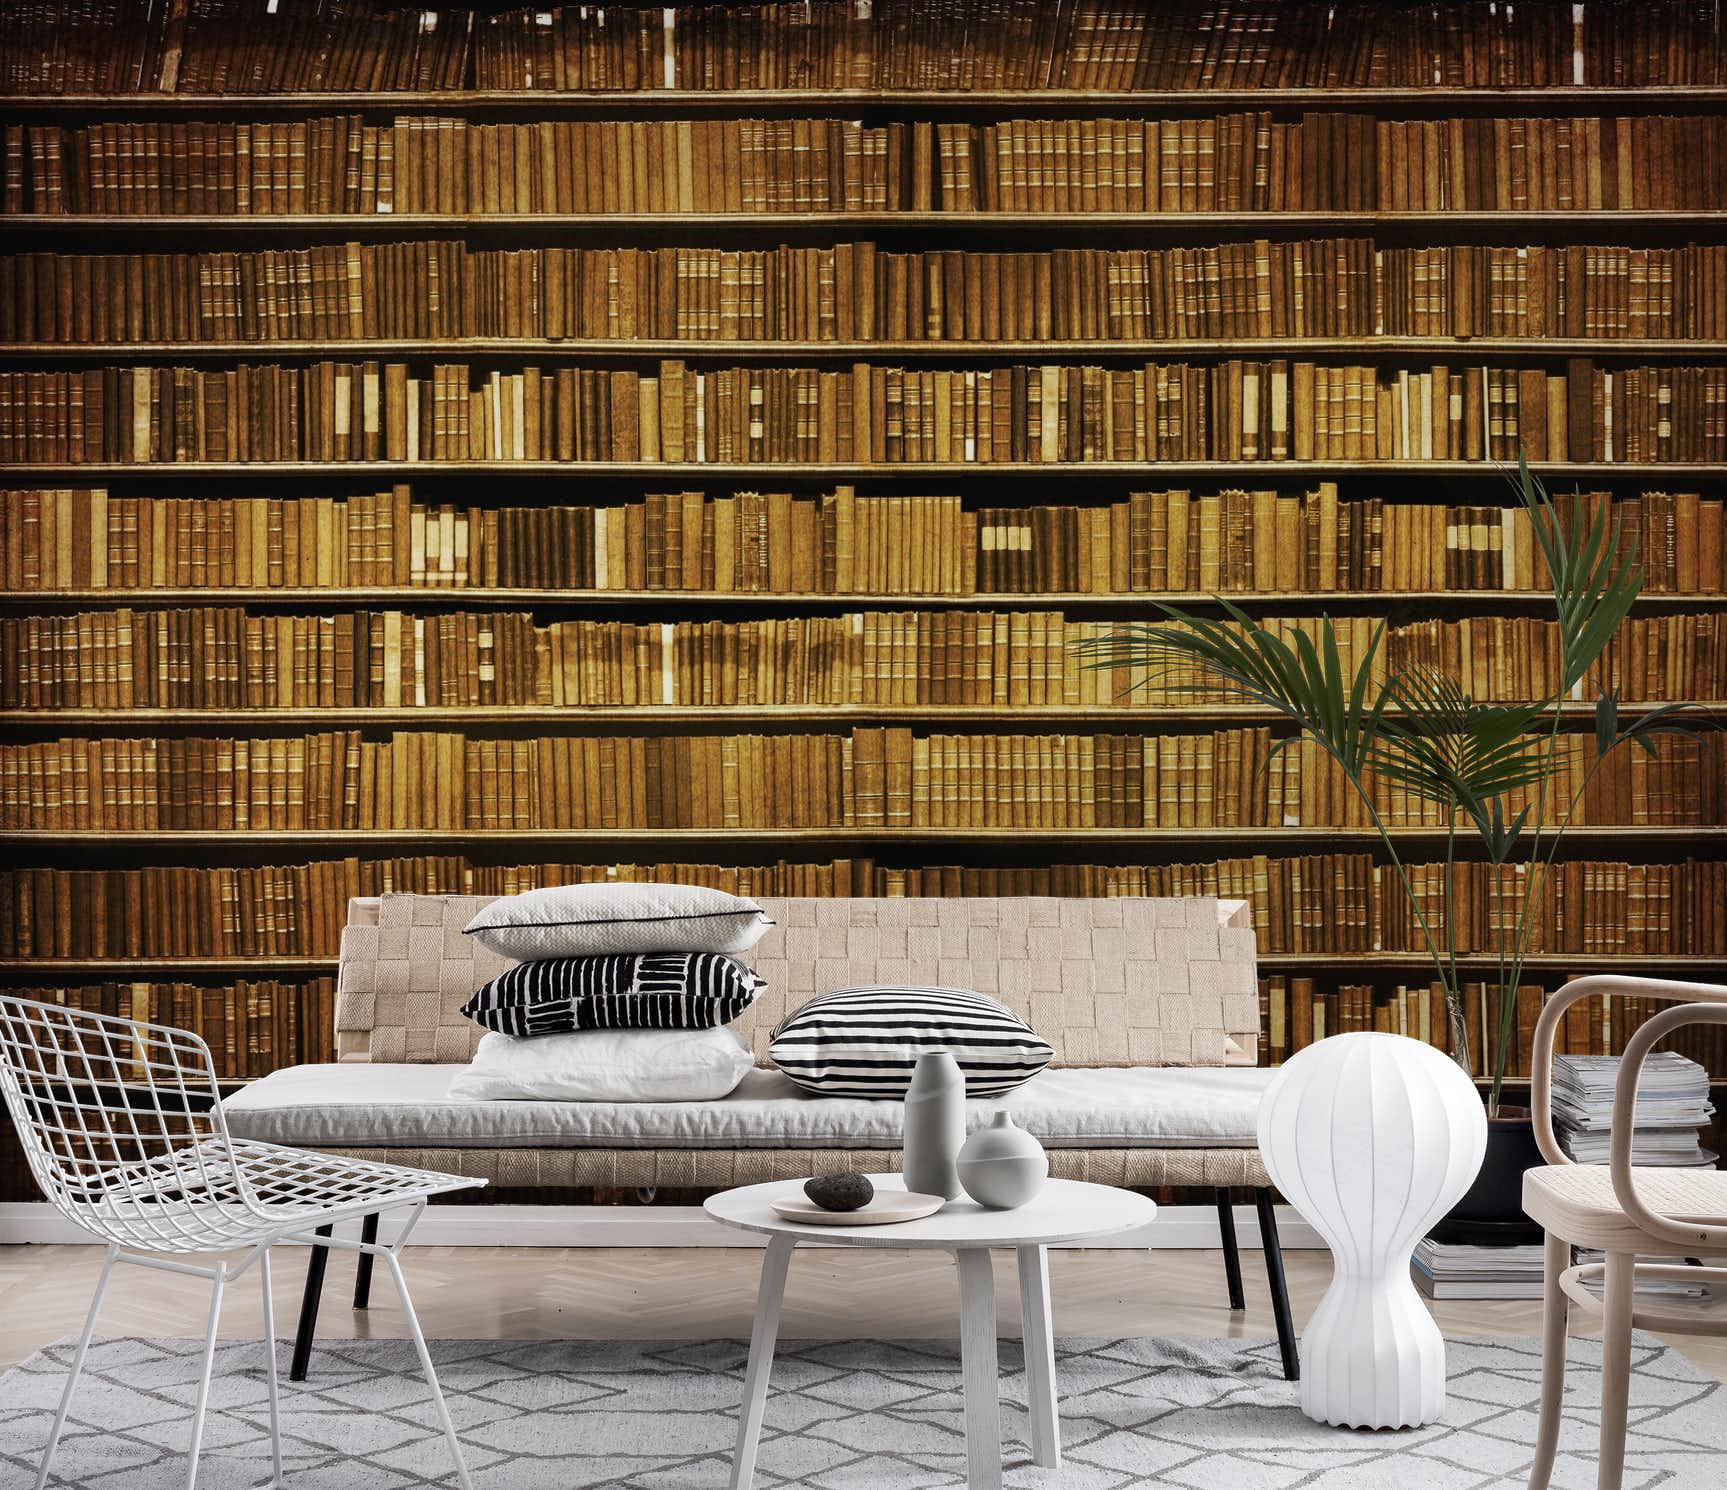 Books grunge wallpaper